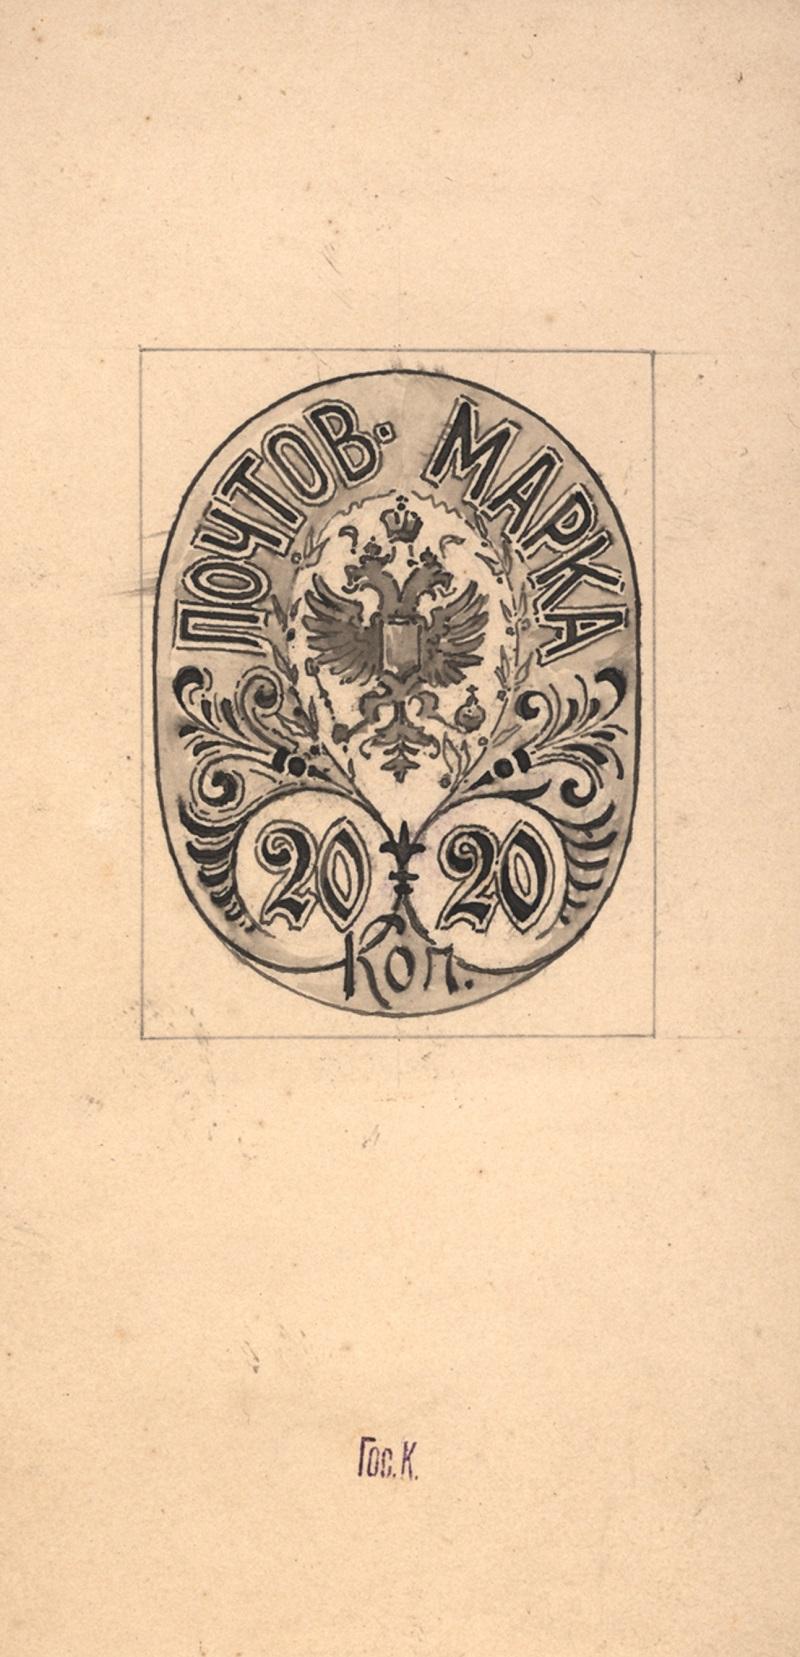 Проект рисунка неизданной марки номиналом 20 копеек